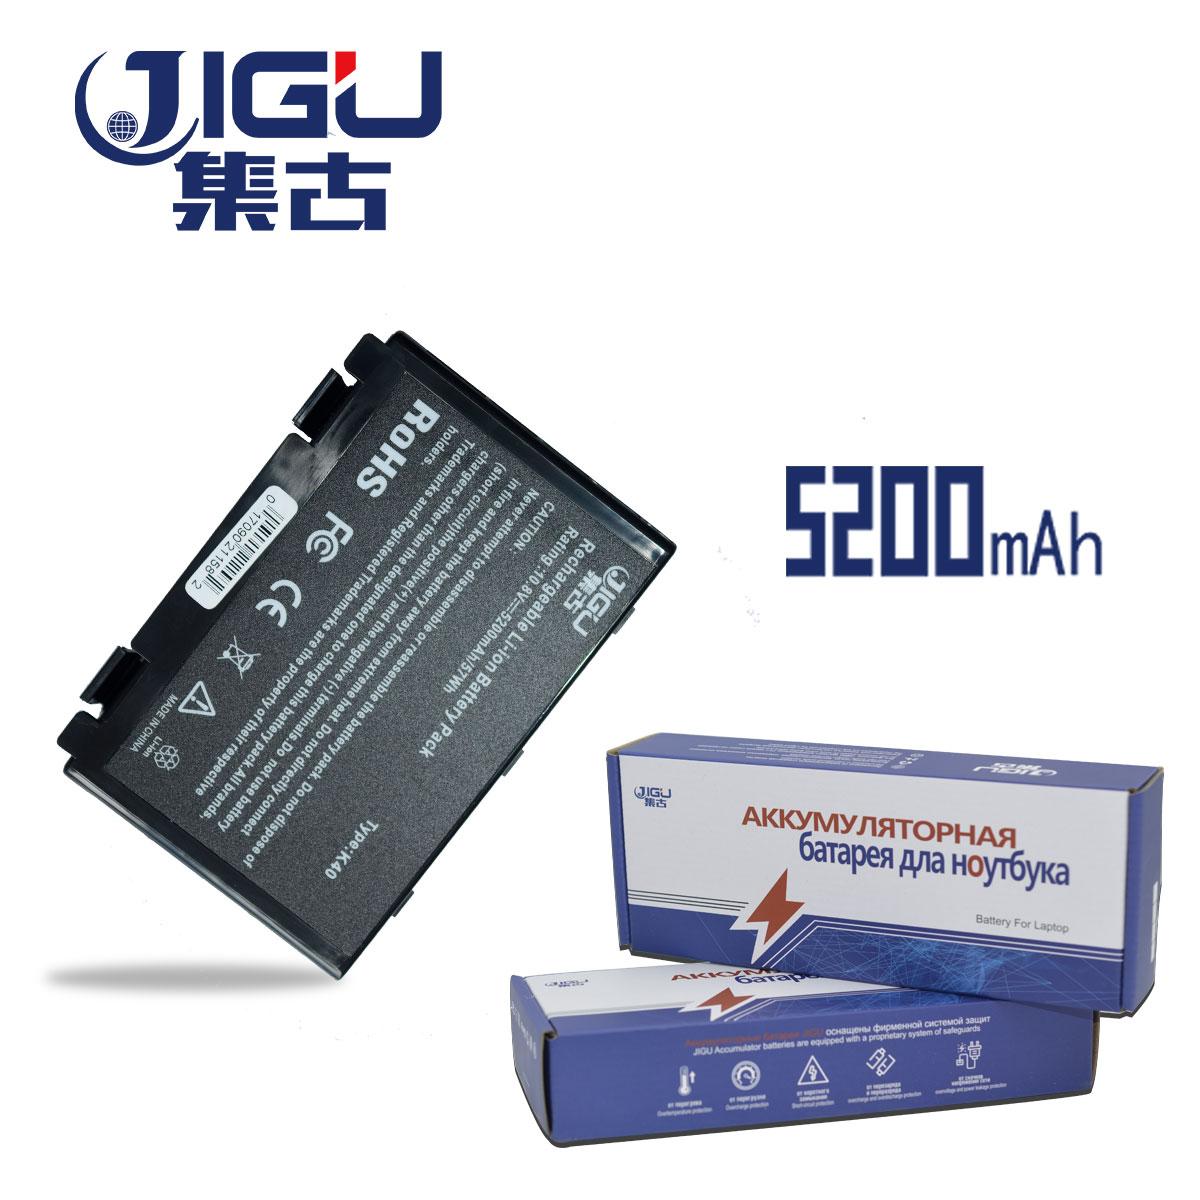 JIGU K50in Laptop Battery For Asus K50AB K70 A32-F52 F82 K50I K60IJ K61IC A32-F52 L0690L6 L0A2016 k50ij цена и фото